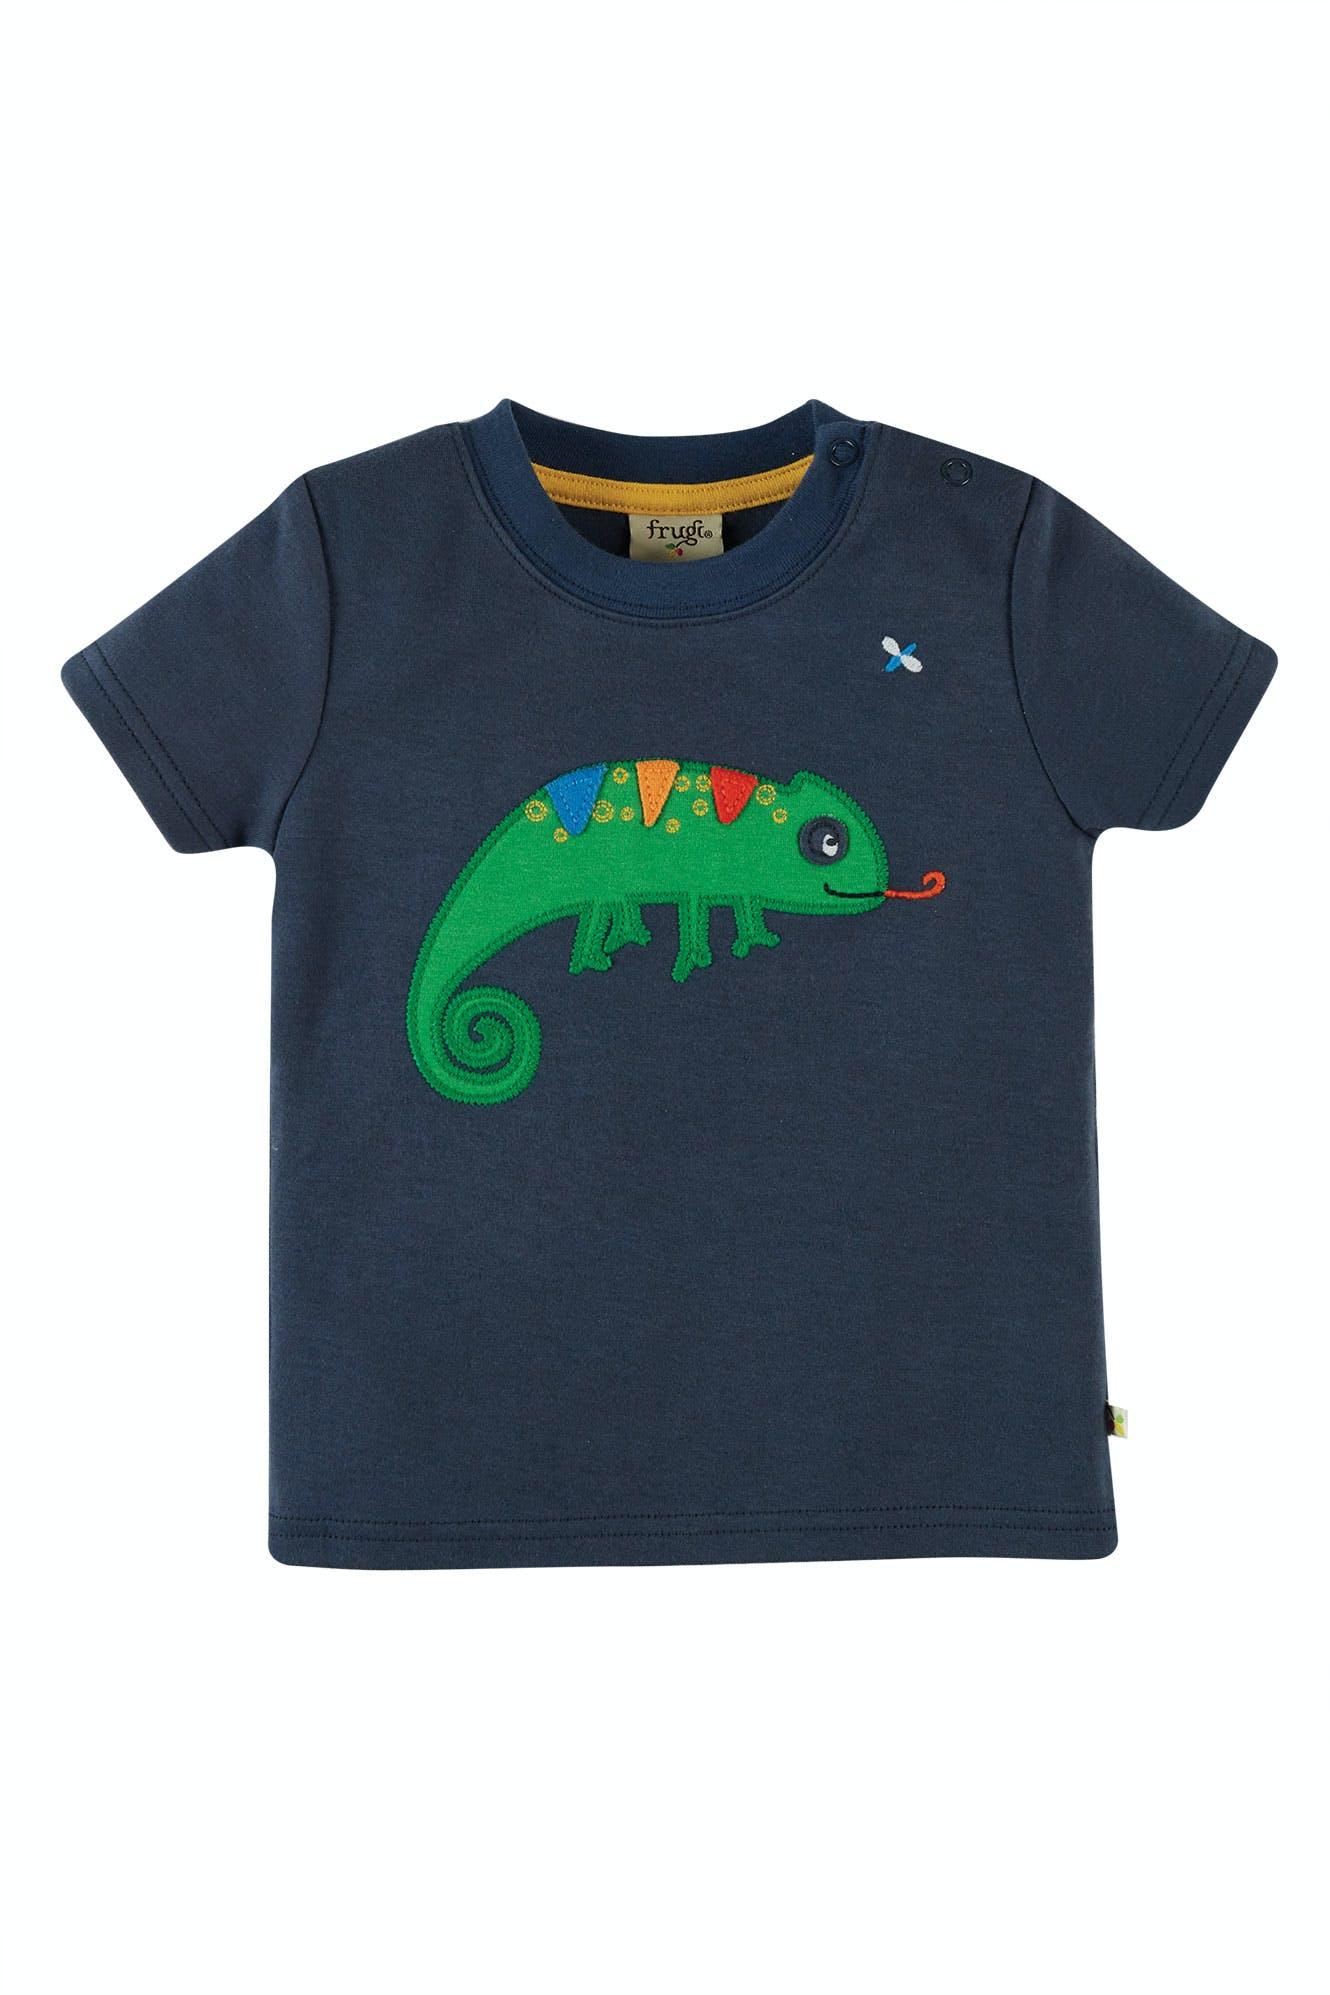 Frugi Scout Applique Top-Indigo/Chameleon